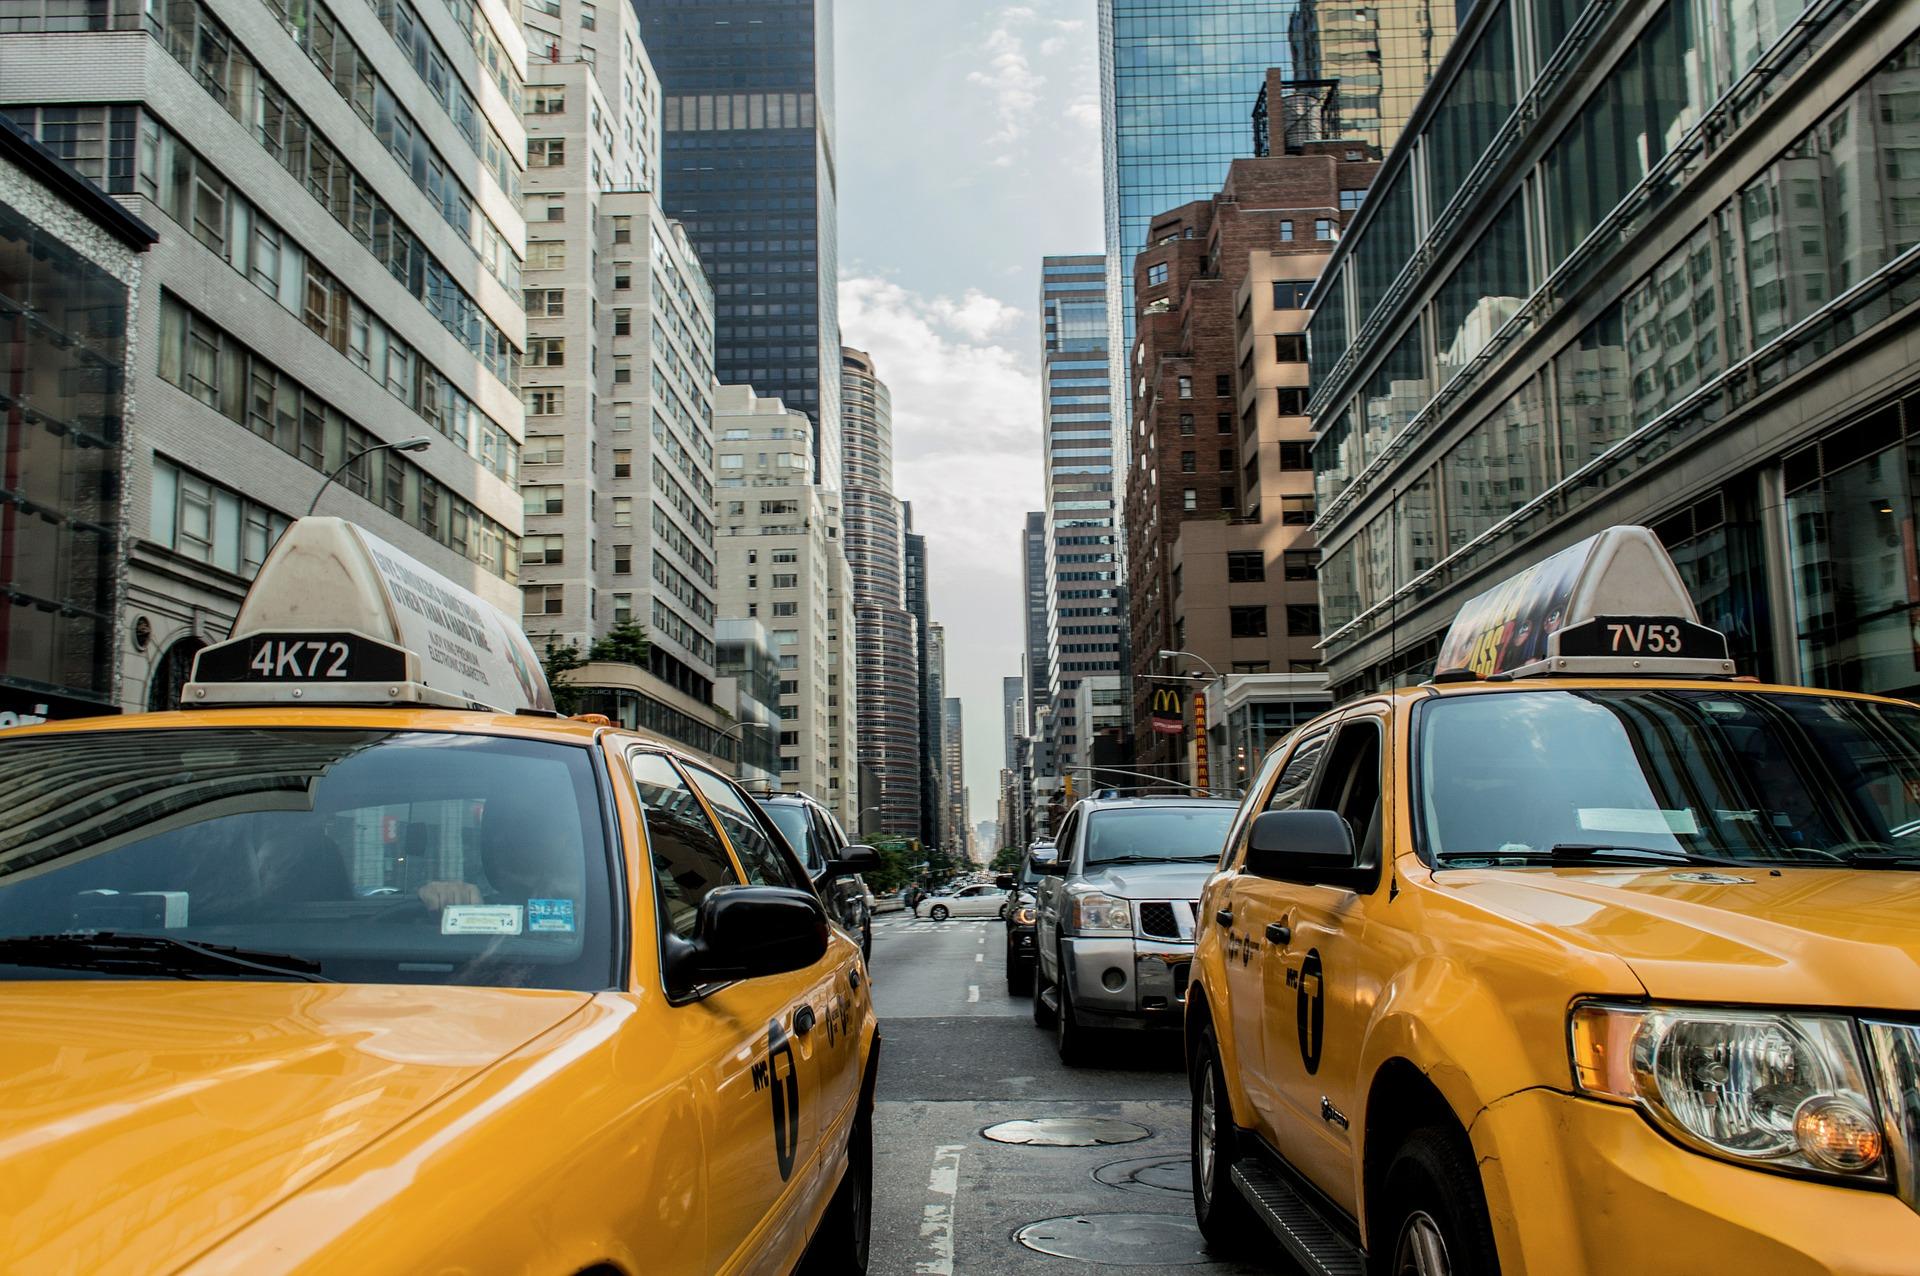 taxi-cab-381233_1920.jpg